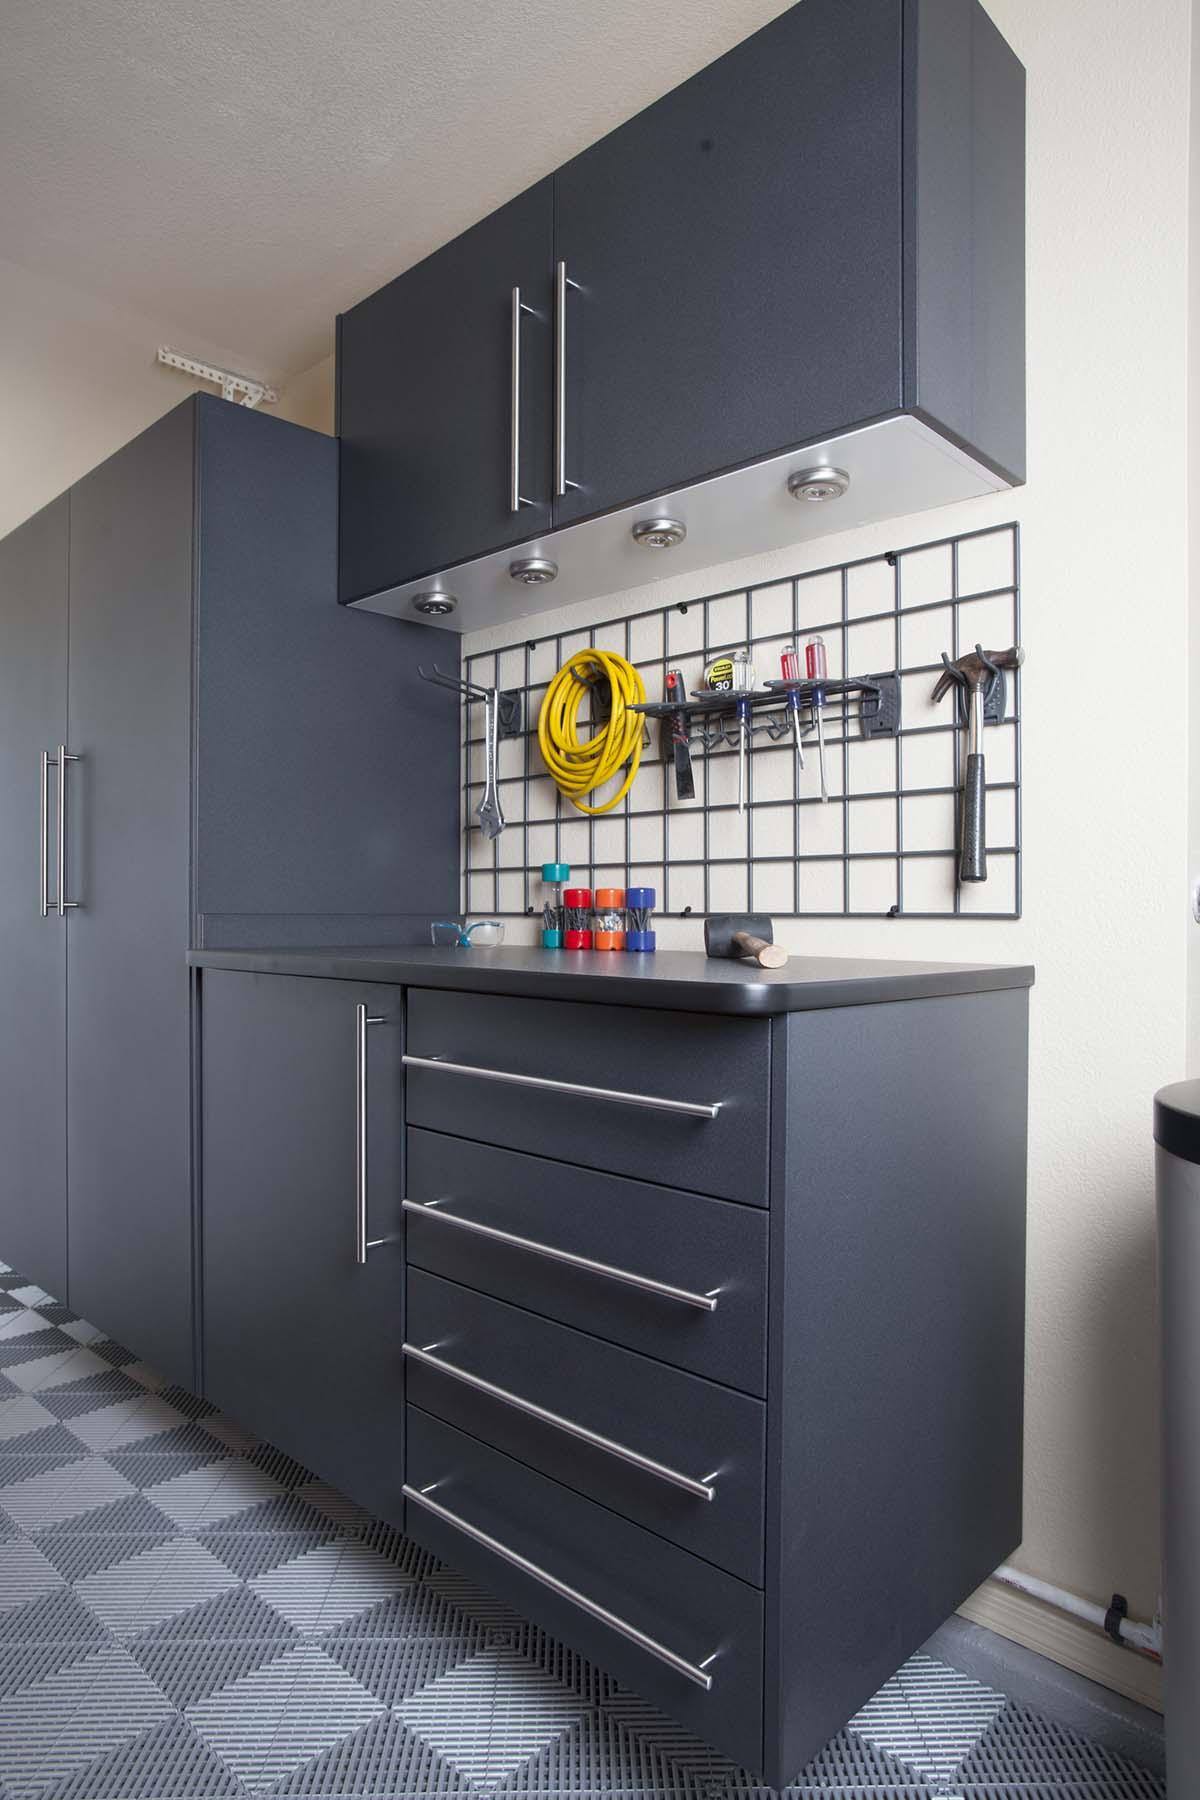 Garage Storage Tool Organization